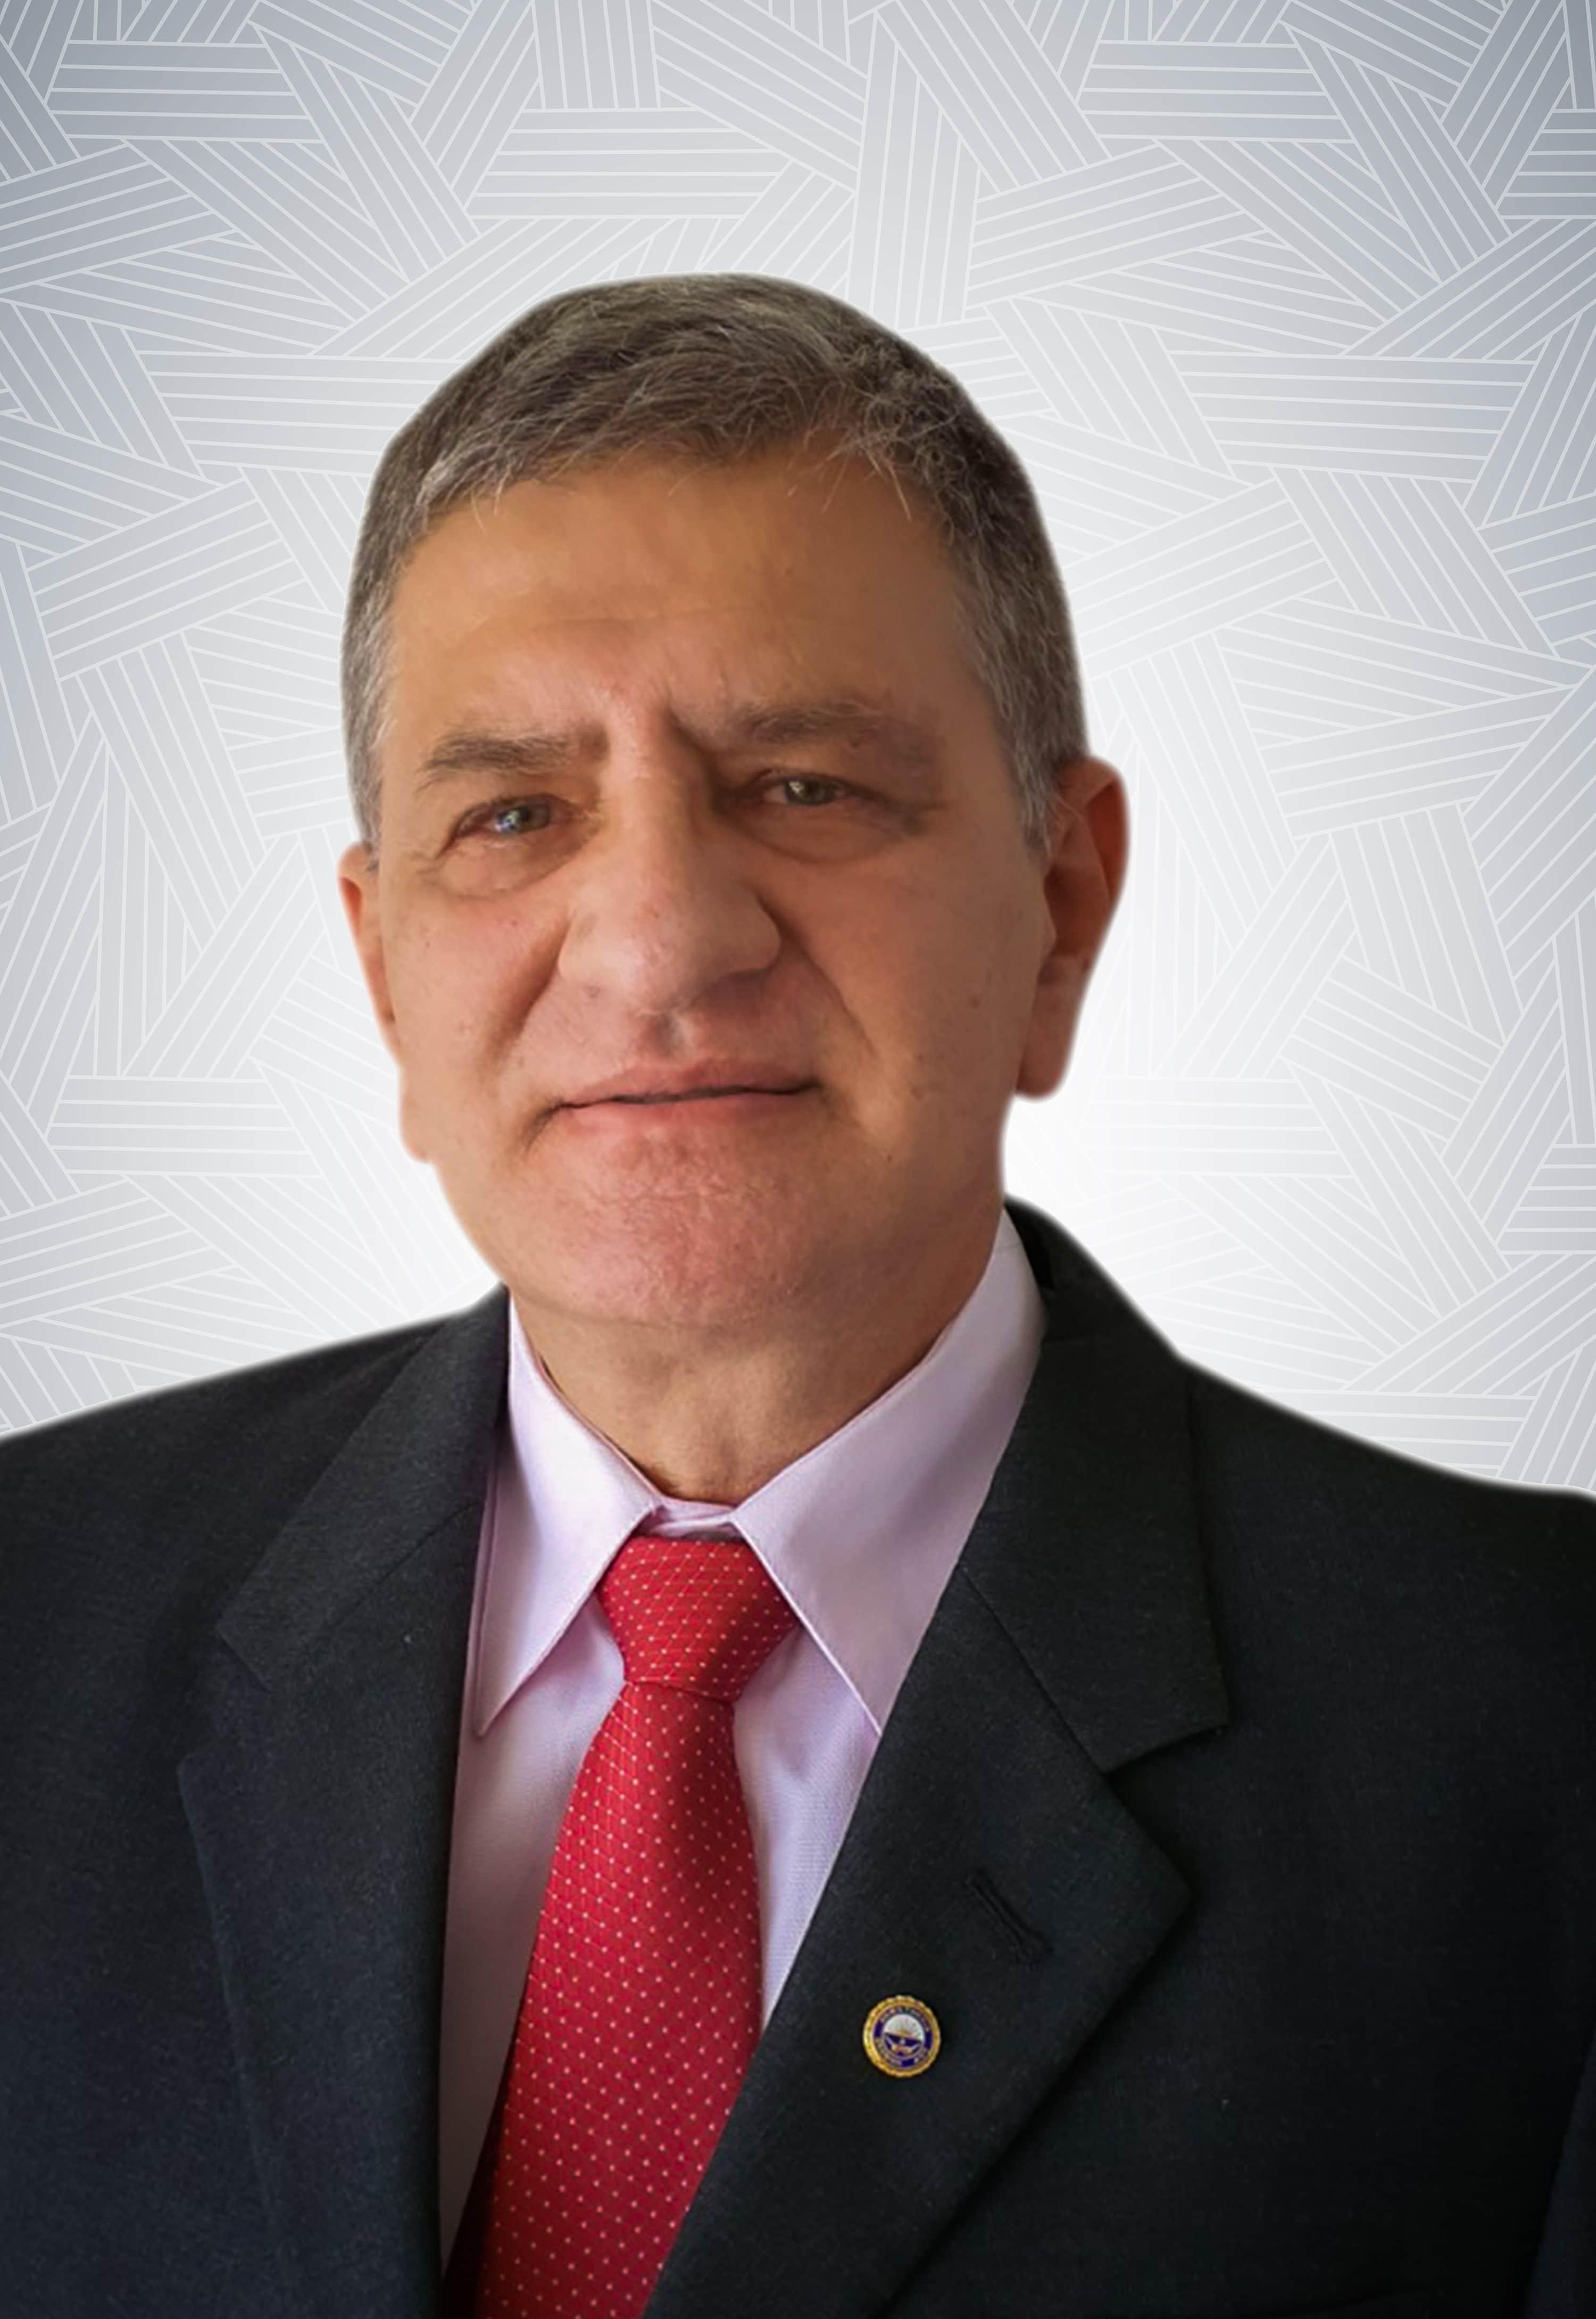 Guillermo Leon Giraldo